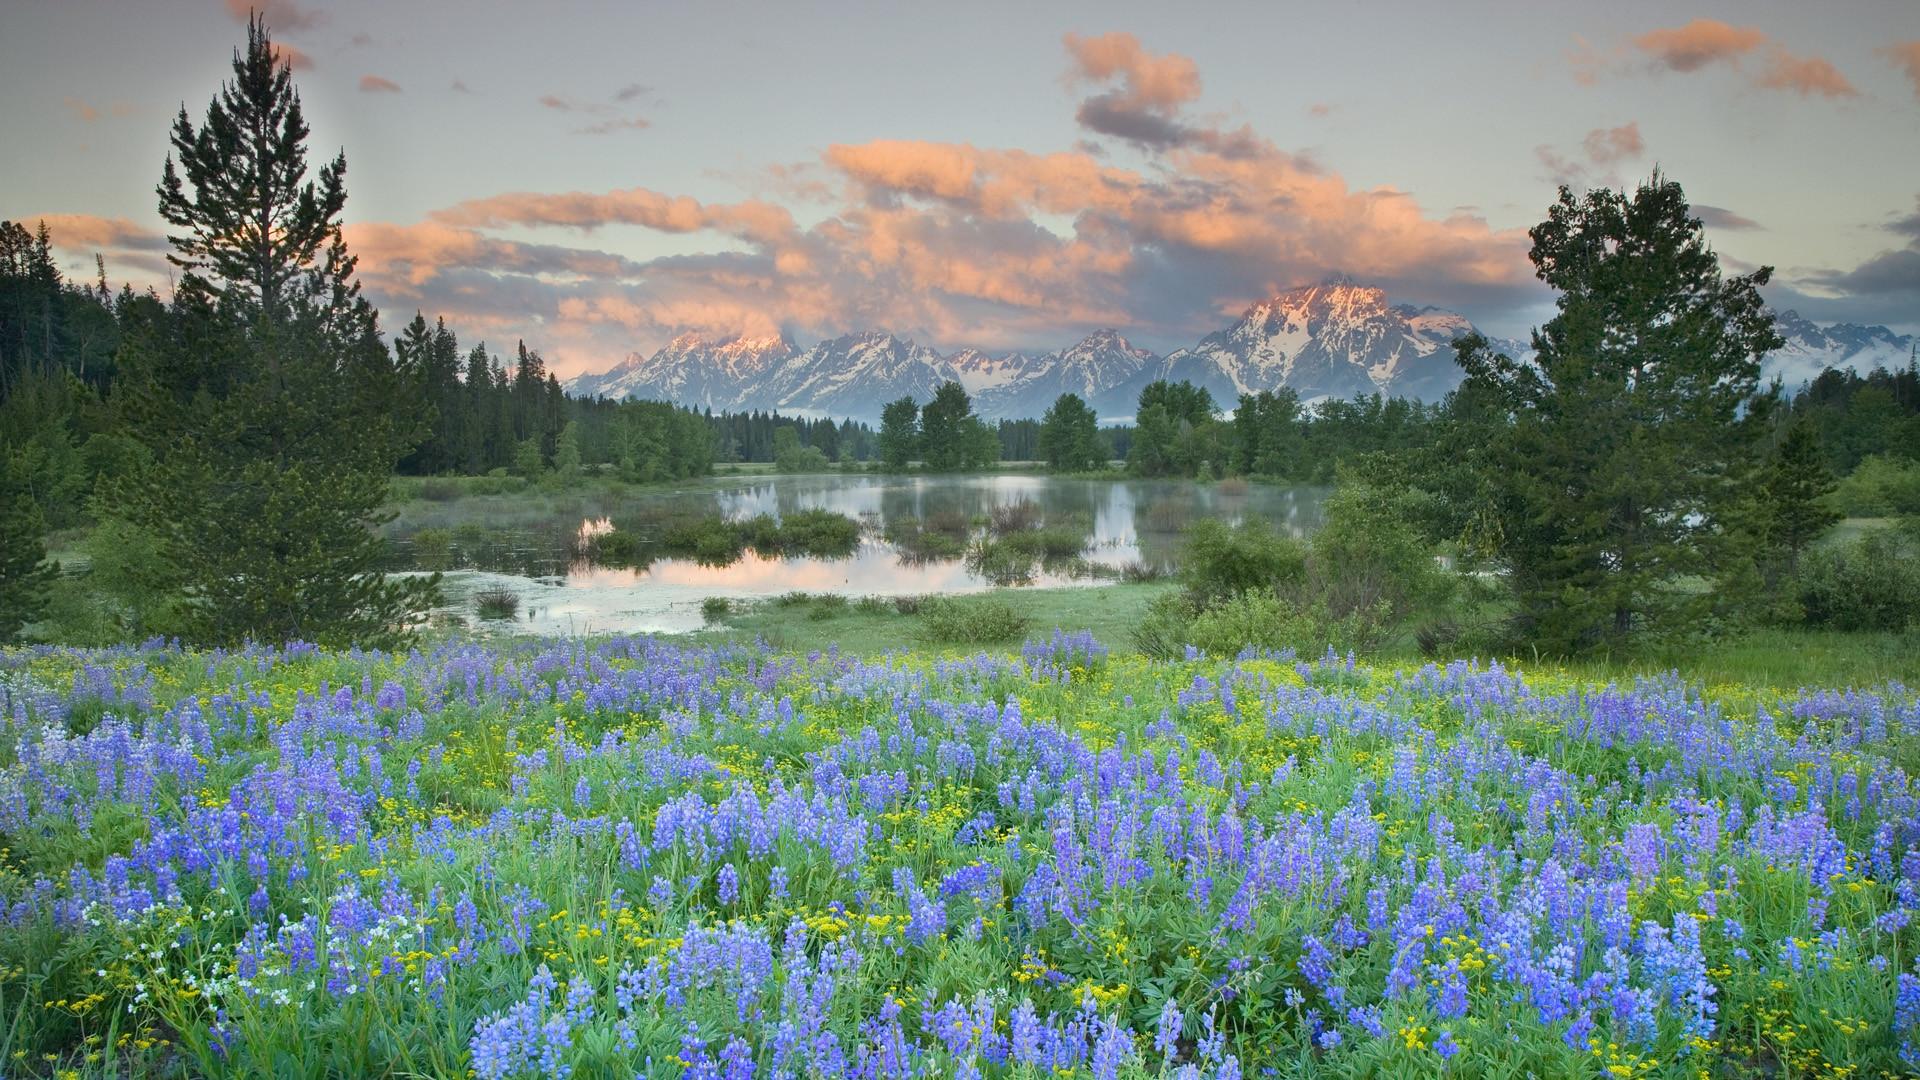 Flower Natural Scene Photos